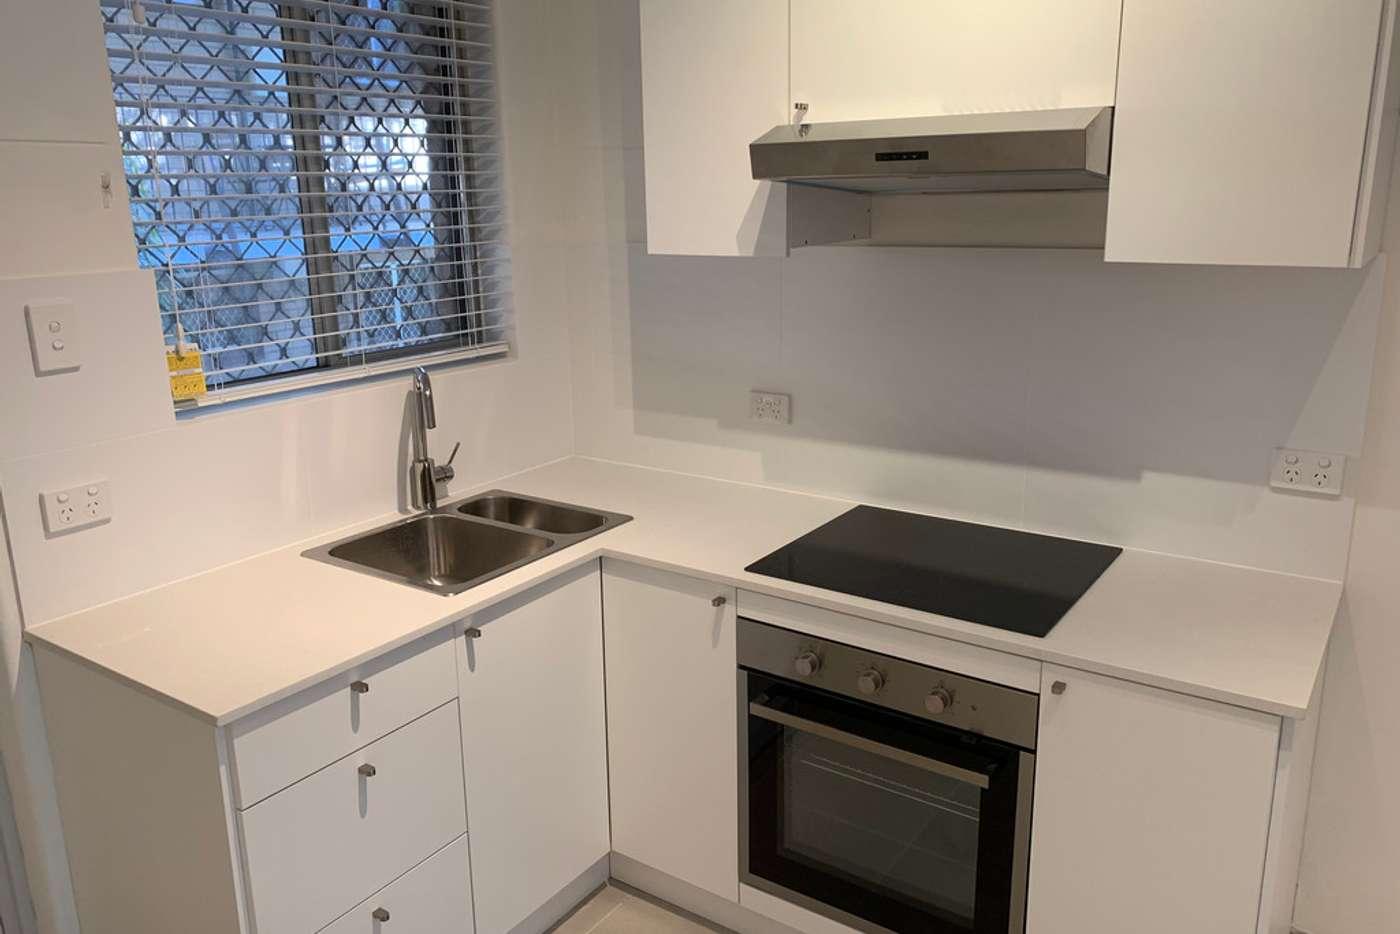 Sixth view of Homely unit listing, 3/187 Walcott Street, Mount Lawley WA 6050